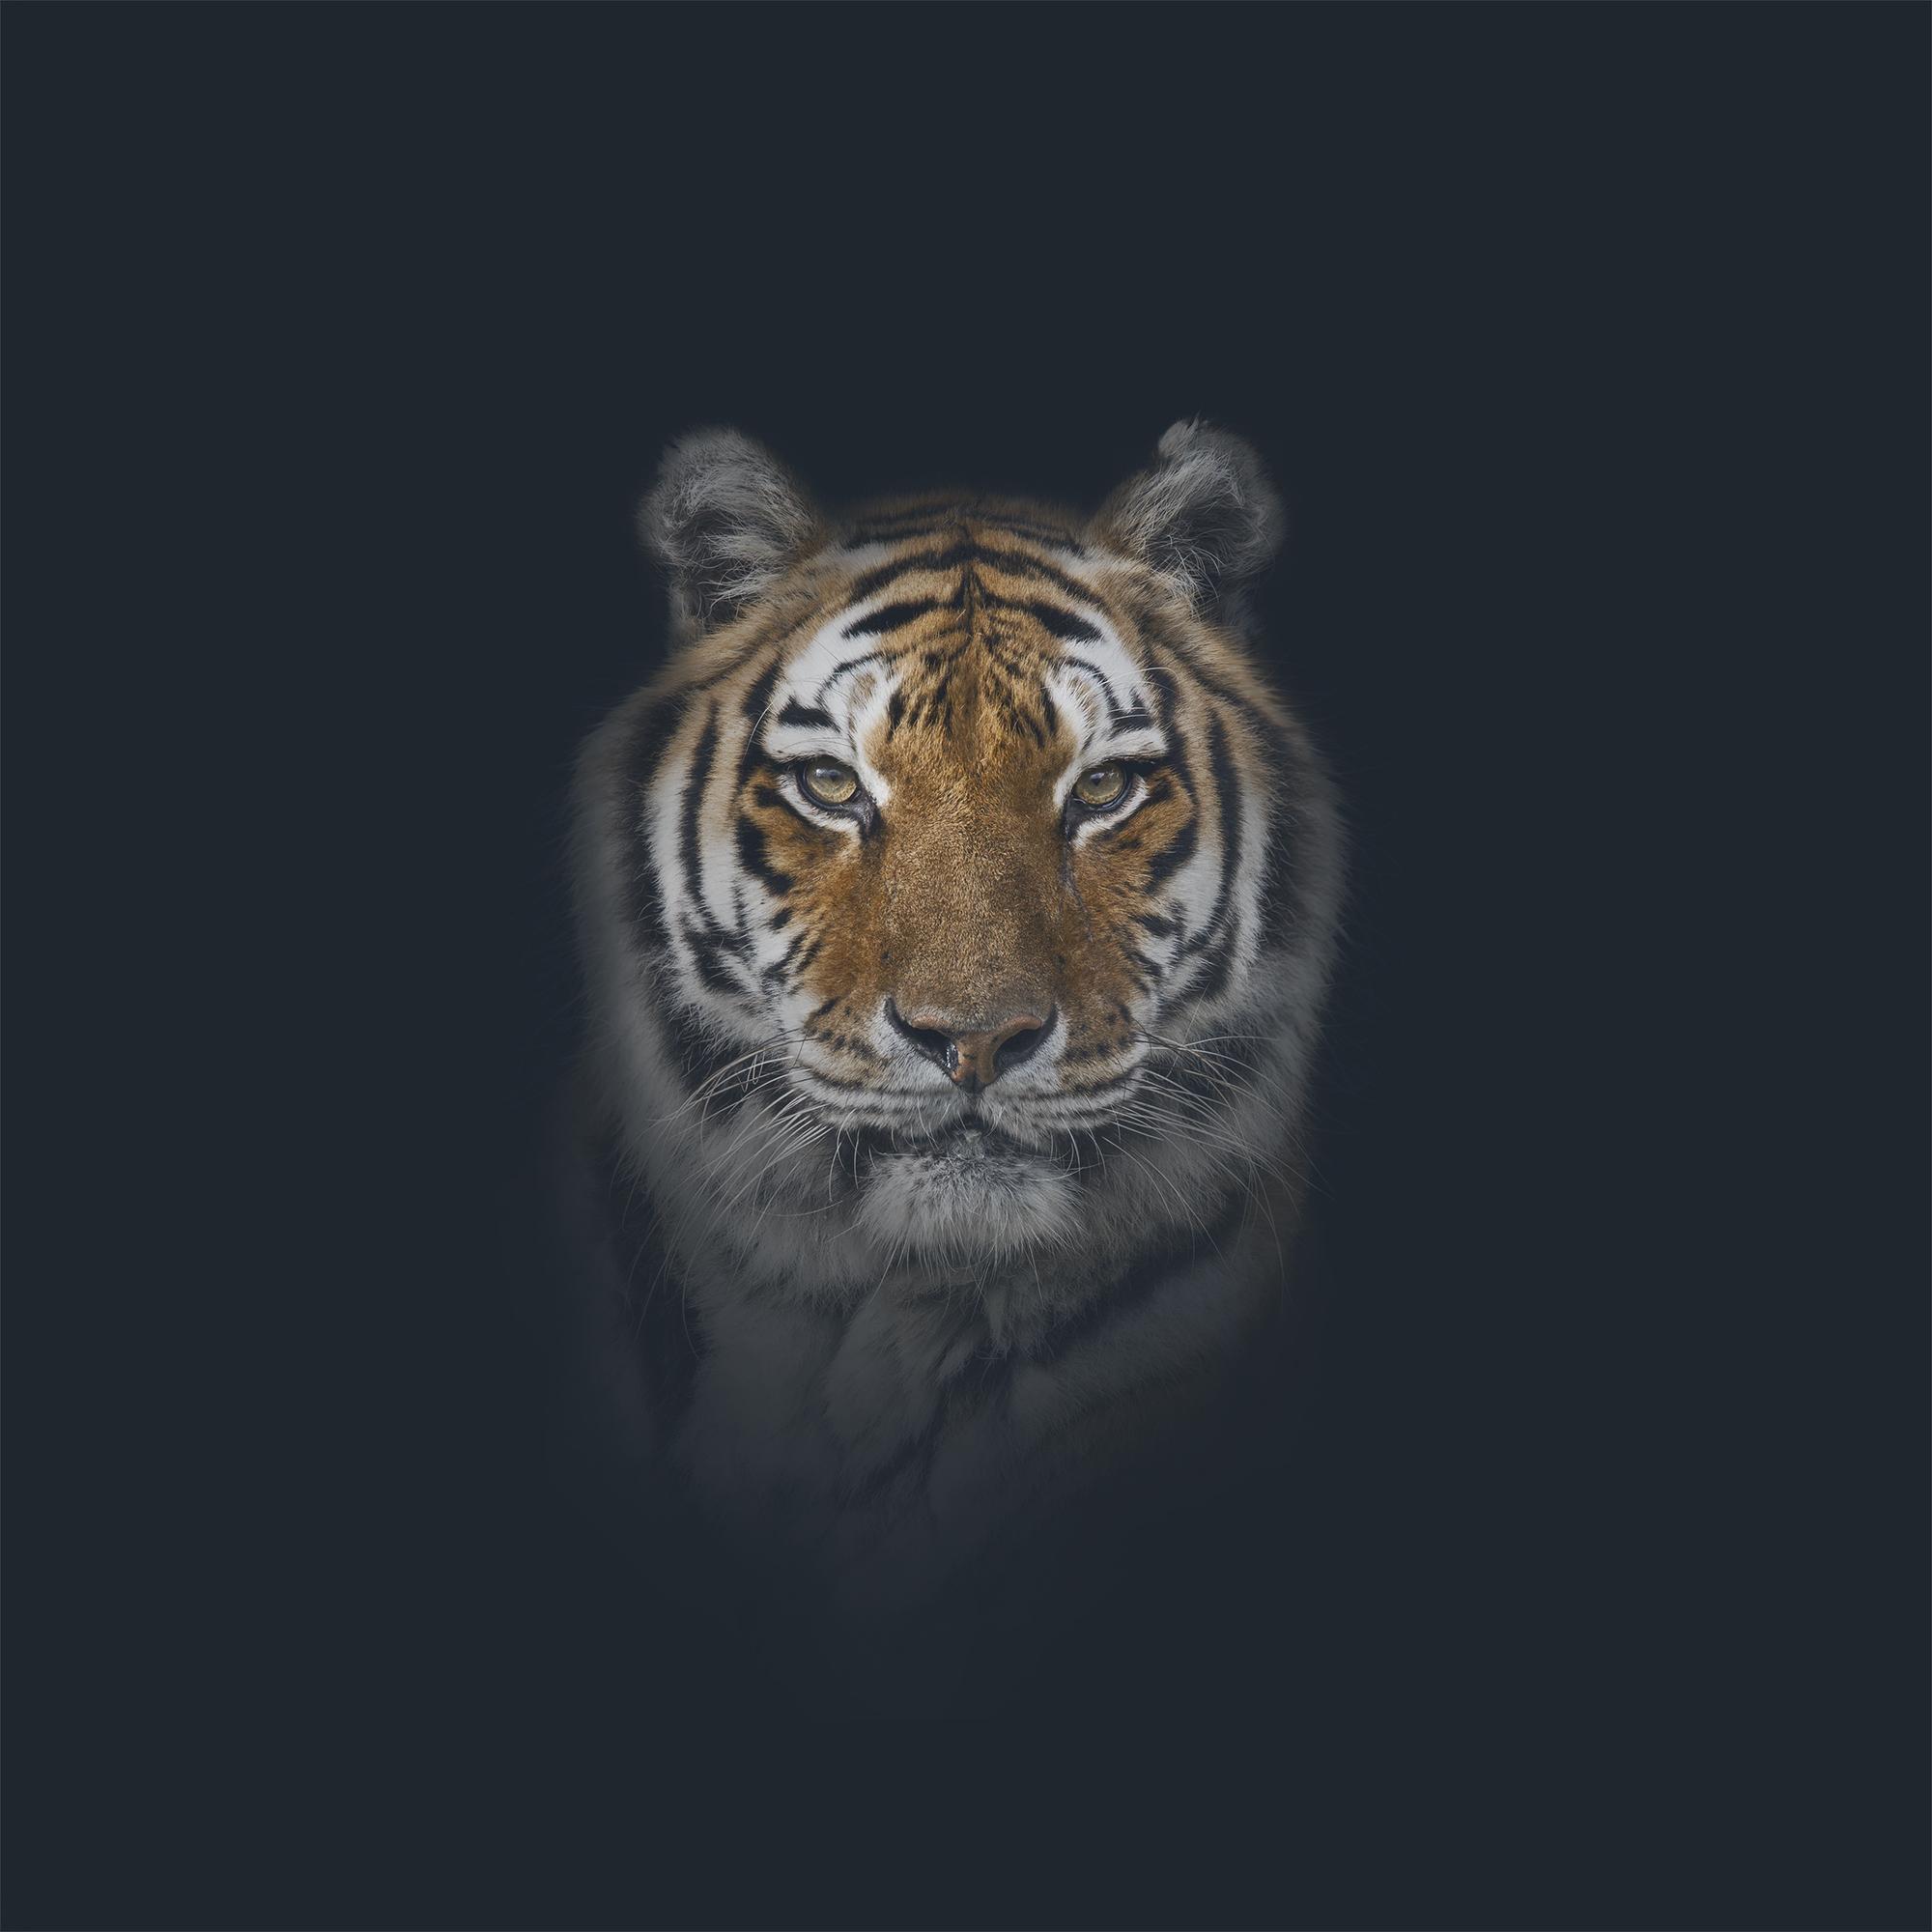 AE_Tiger.jpg